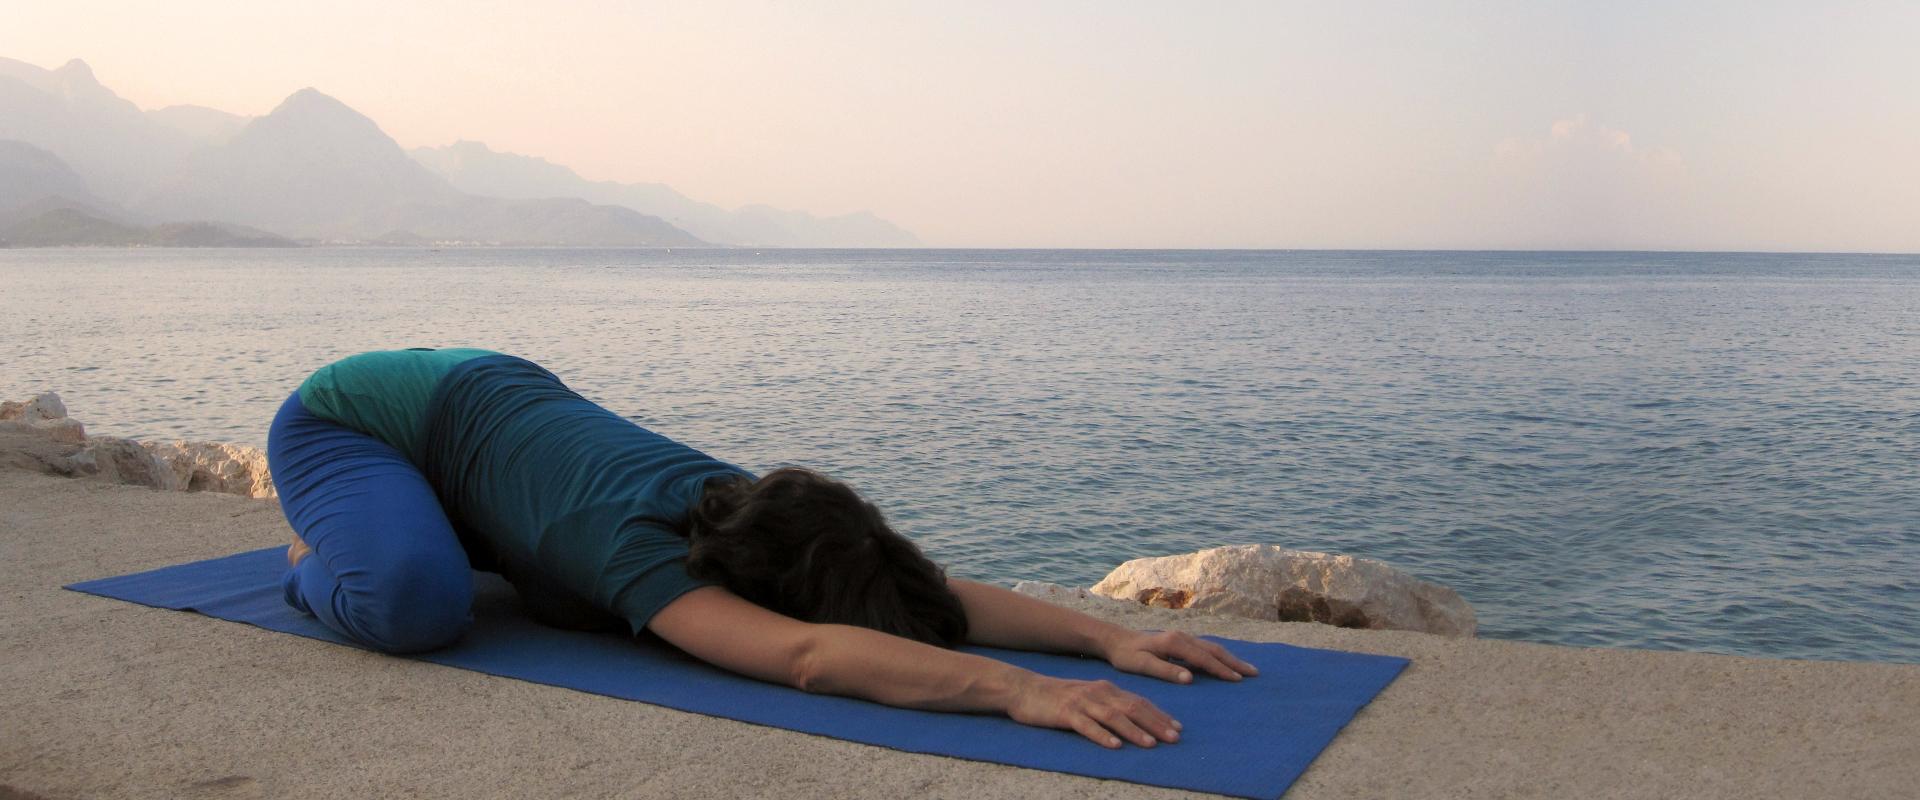 yogashakti_slider_home_02